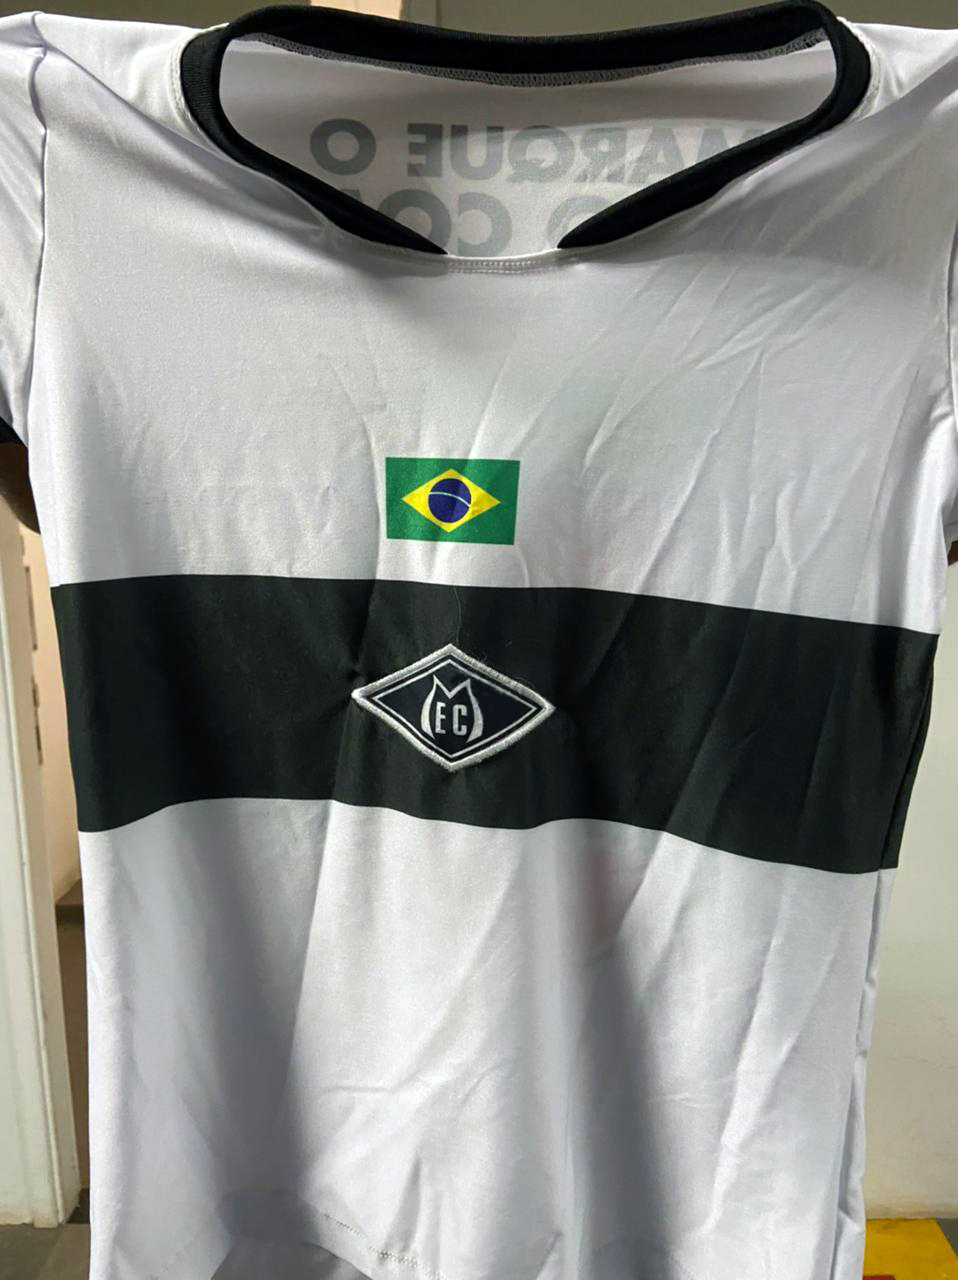 Camisa uniforme de futebol